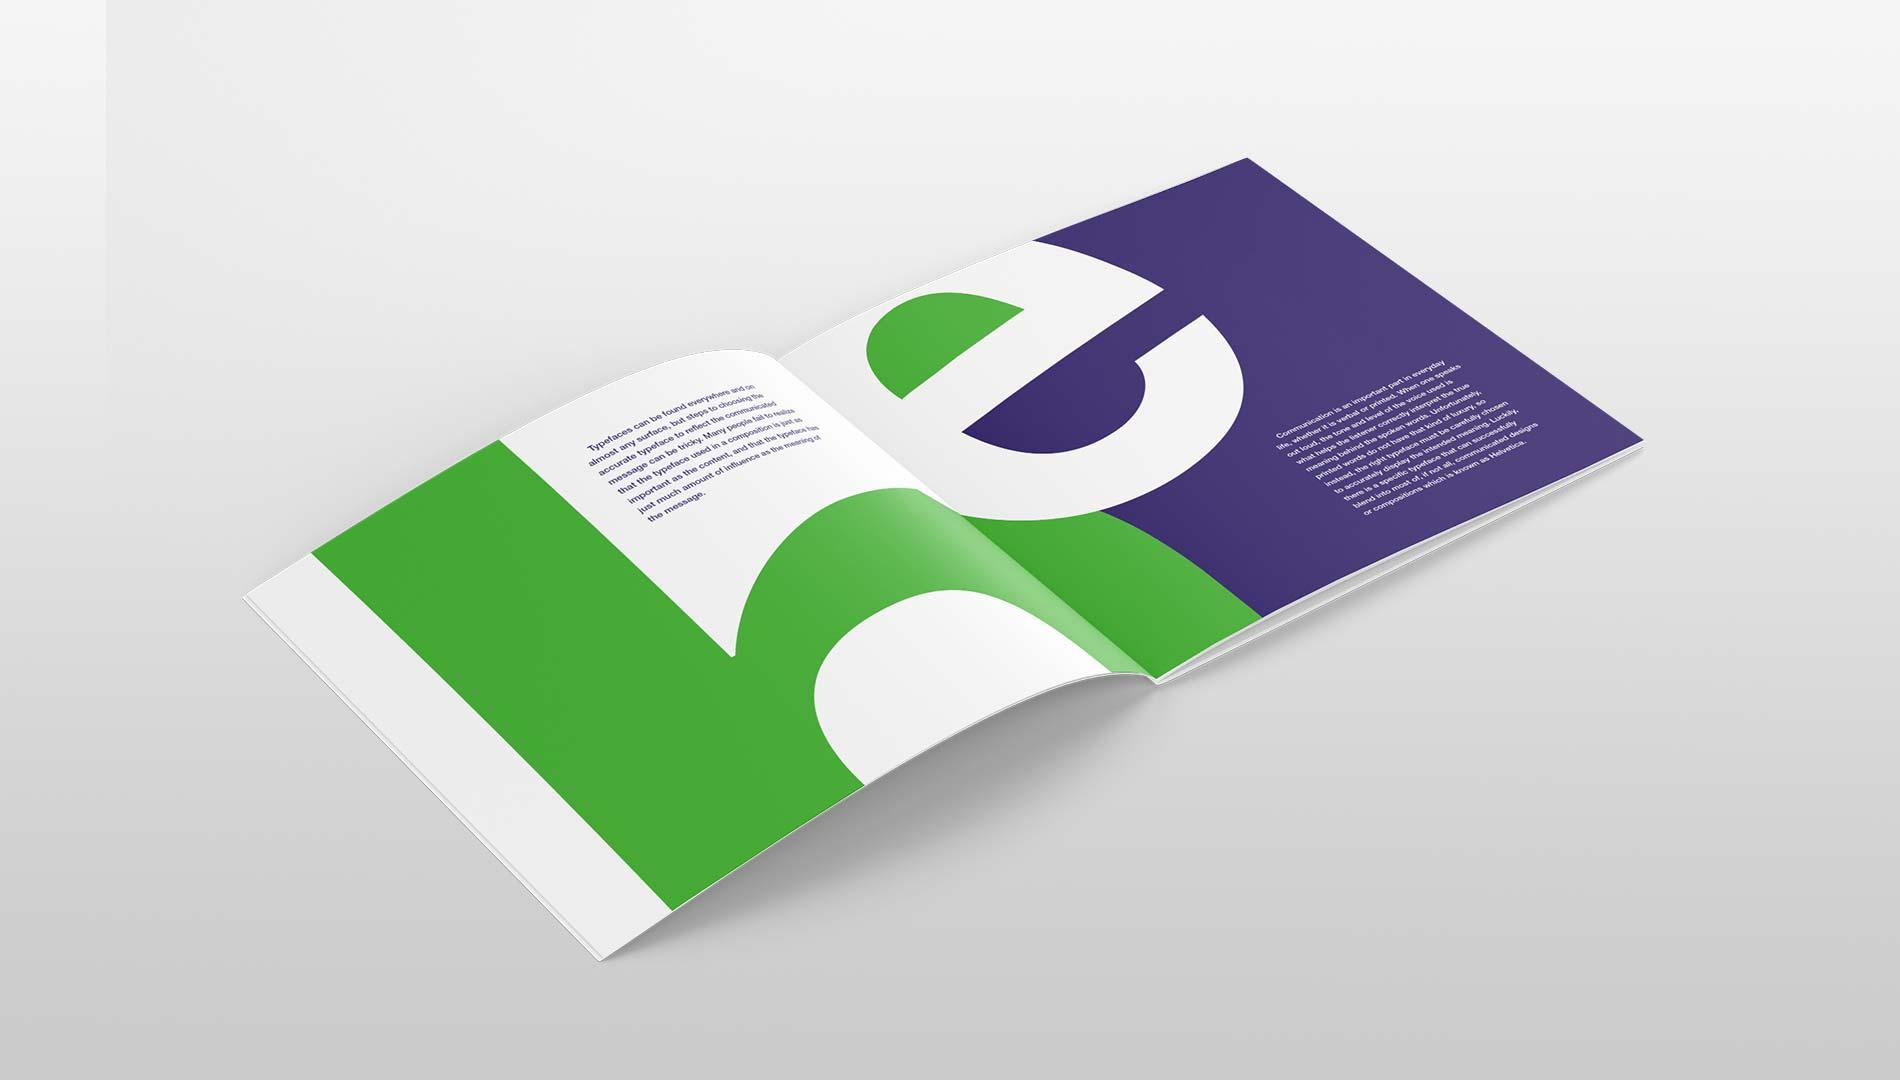 nusaibah_el-omari_booklet_4